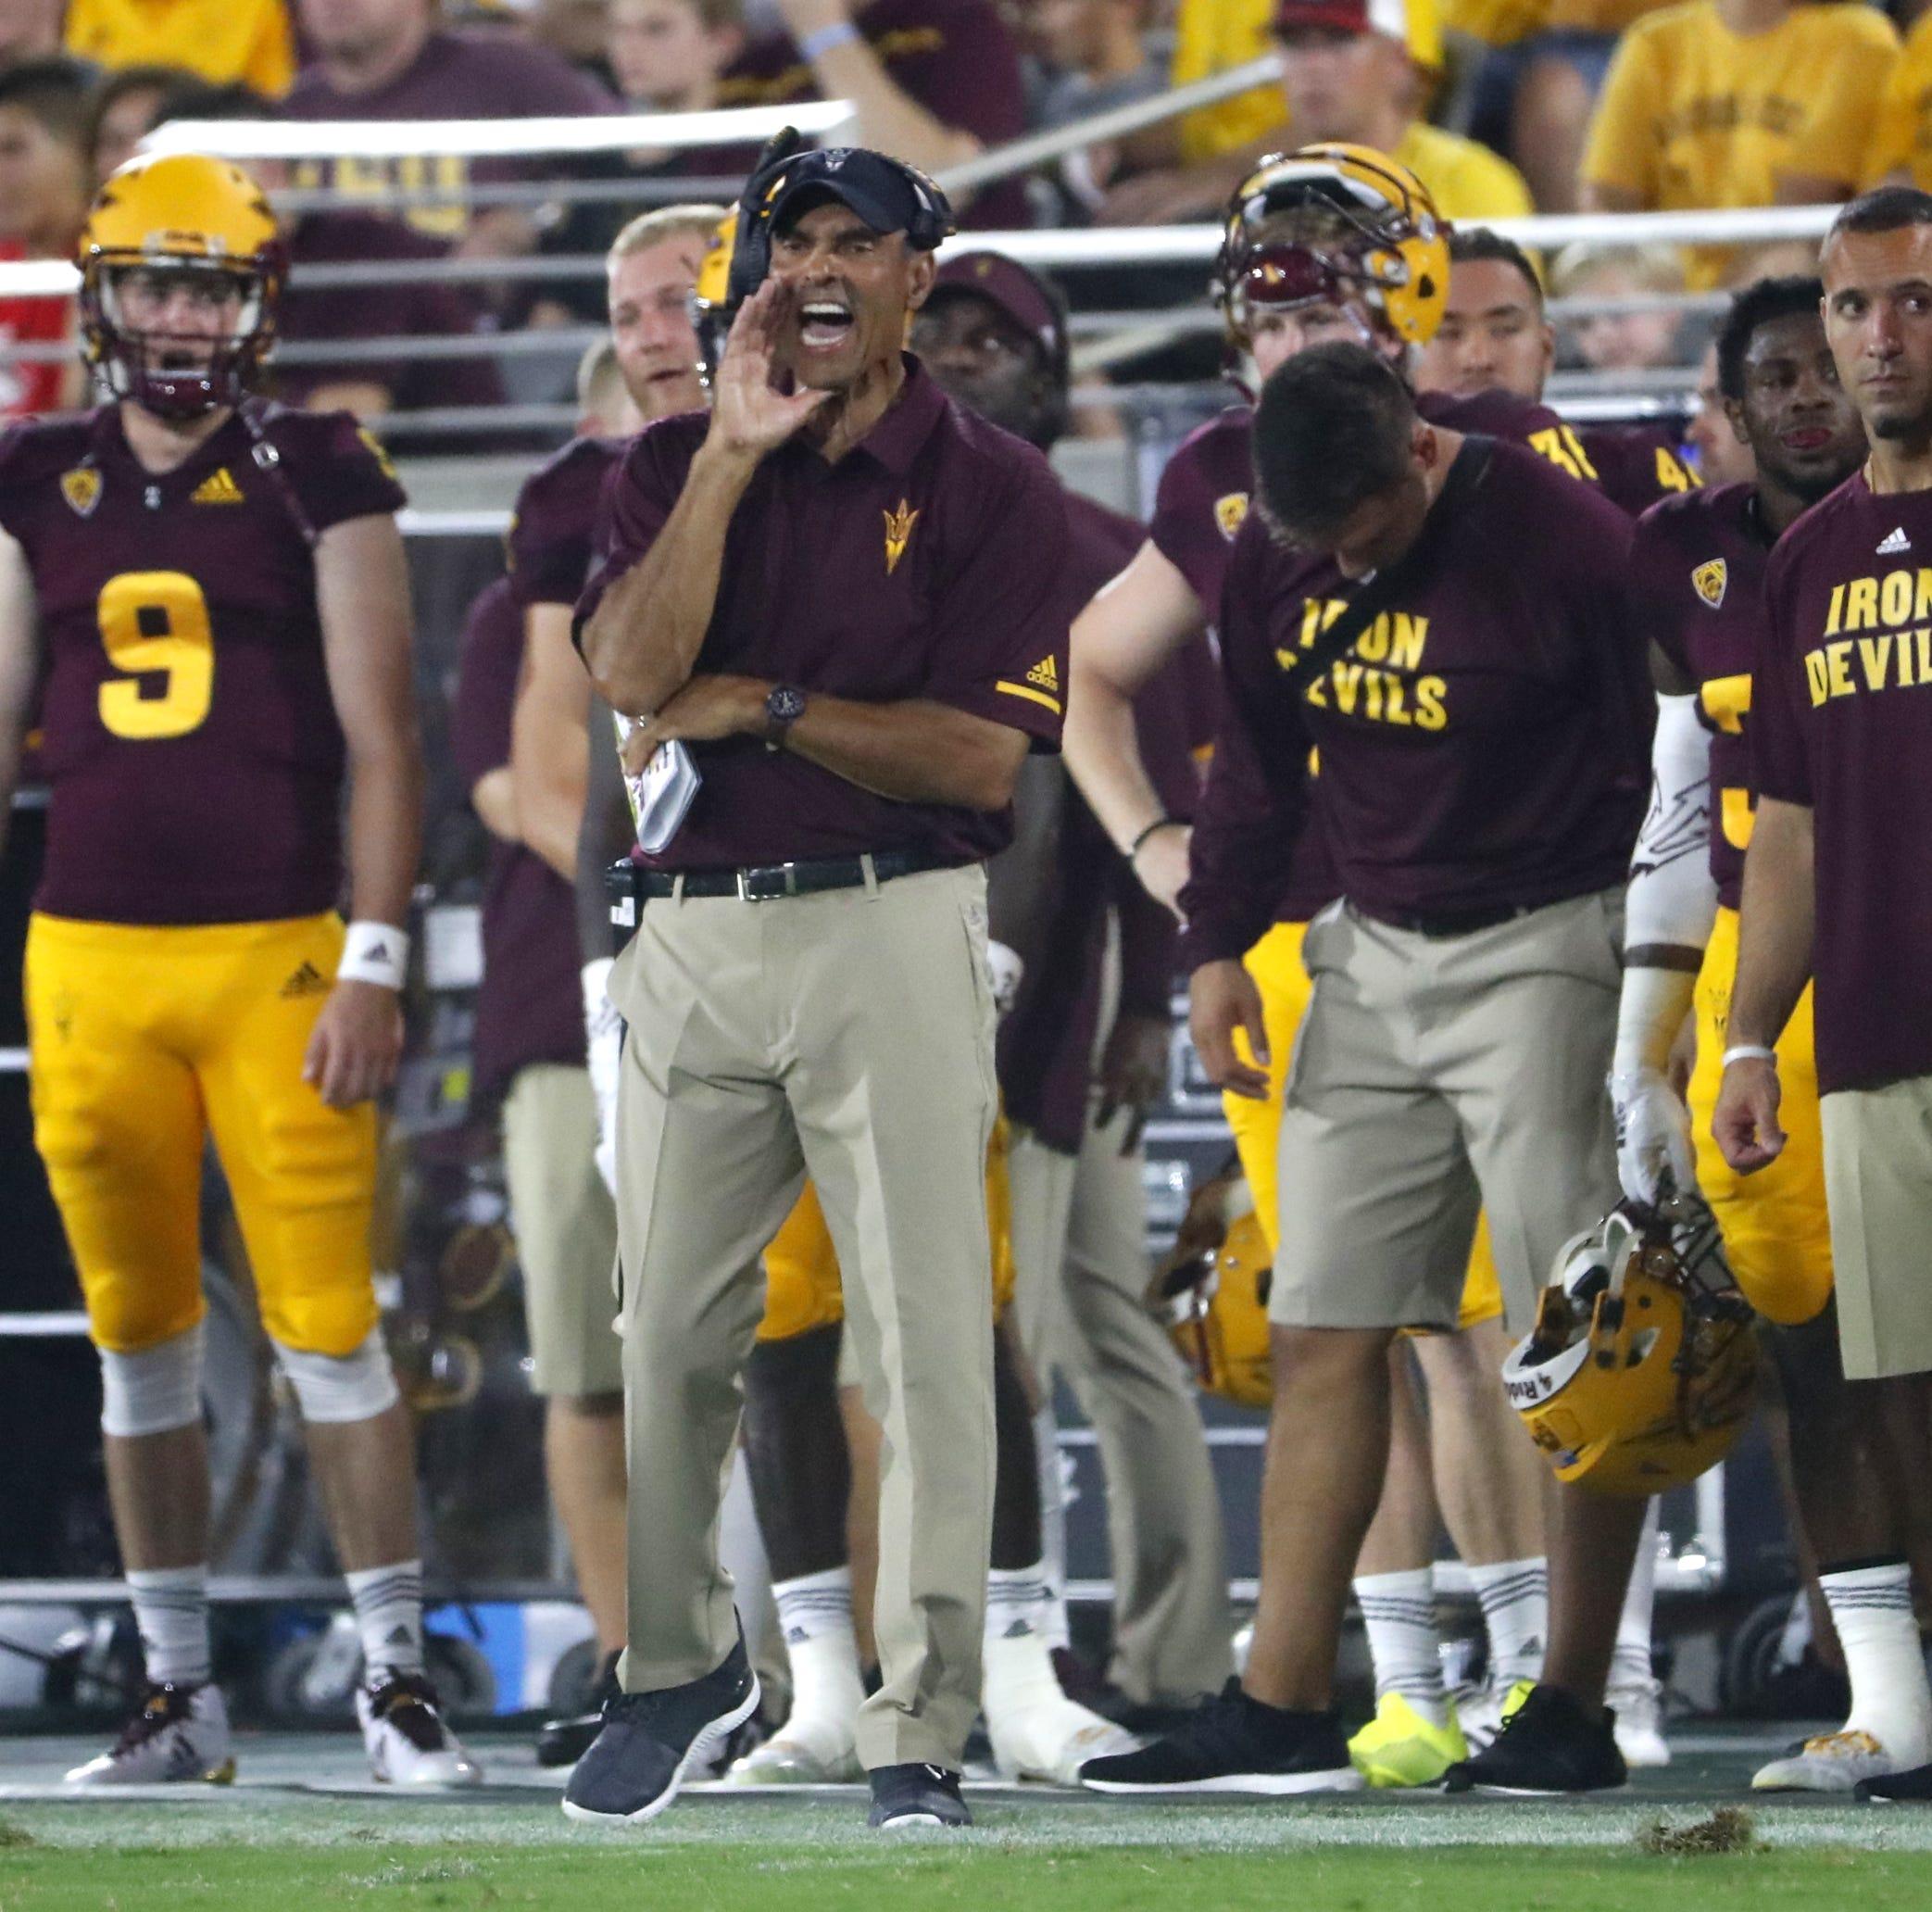 ASU football vs. No. 13 Michigan State: Scouting report, prediction